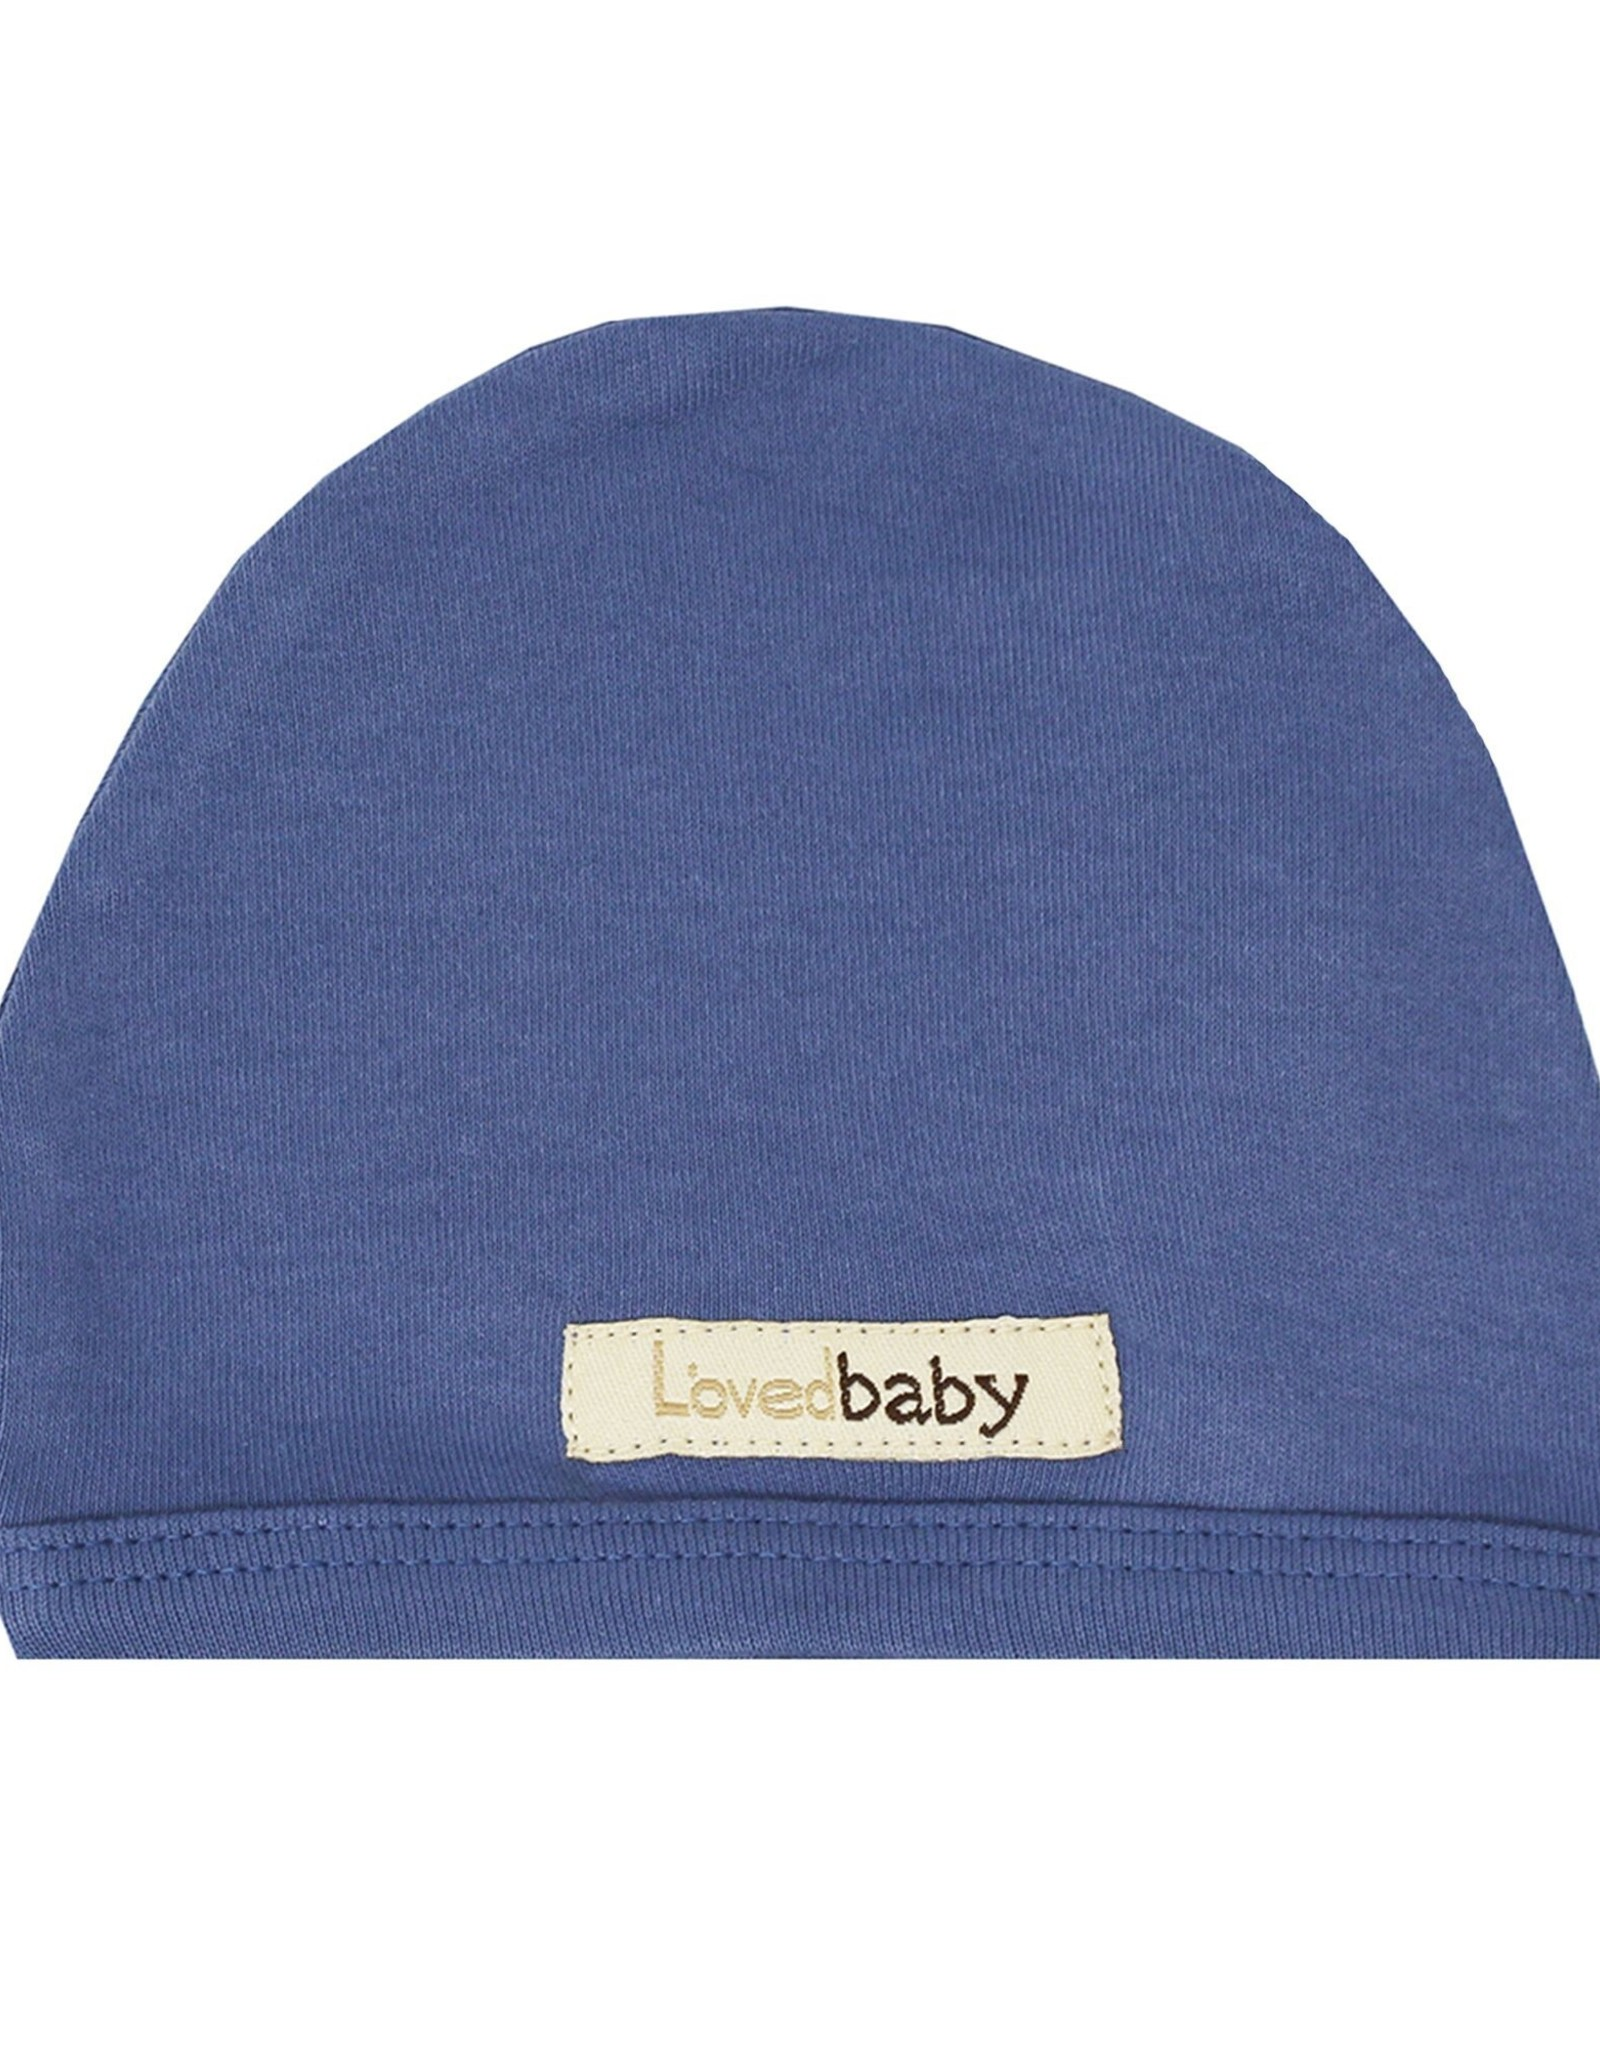 L'oved Baby Organic Cute Cap- Slate